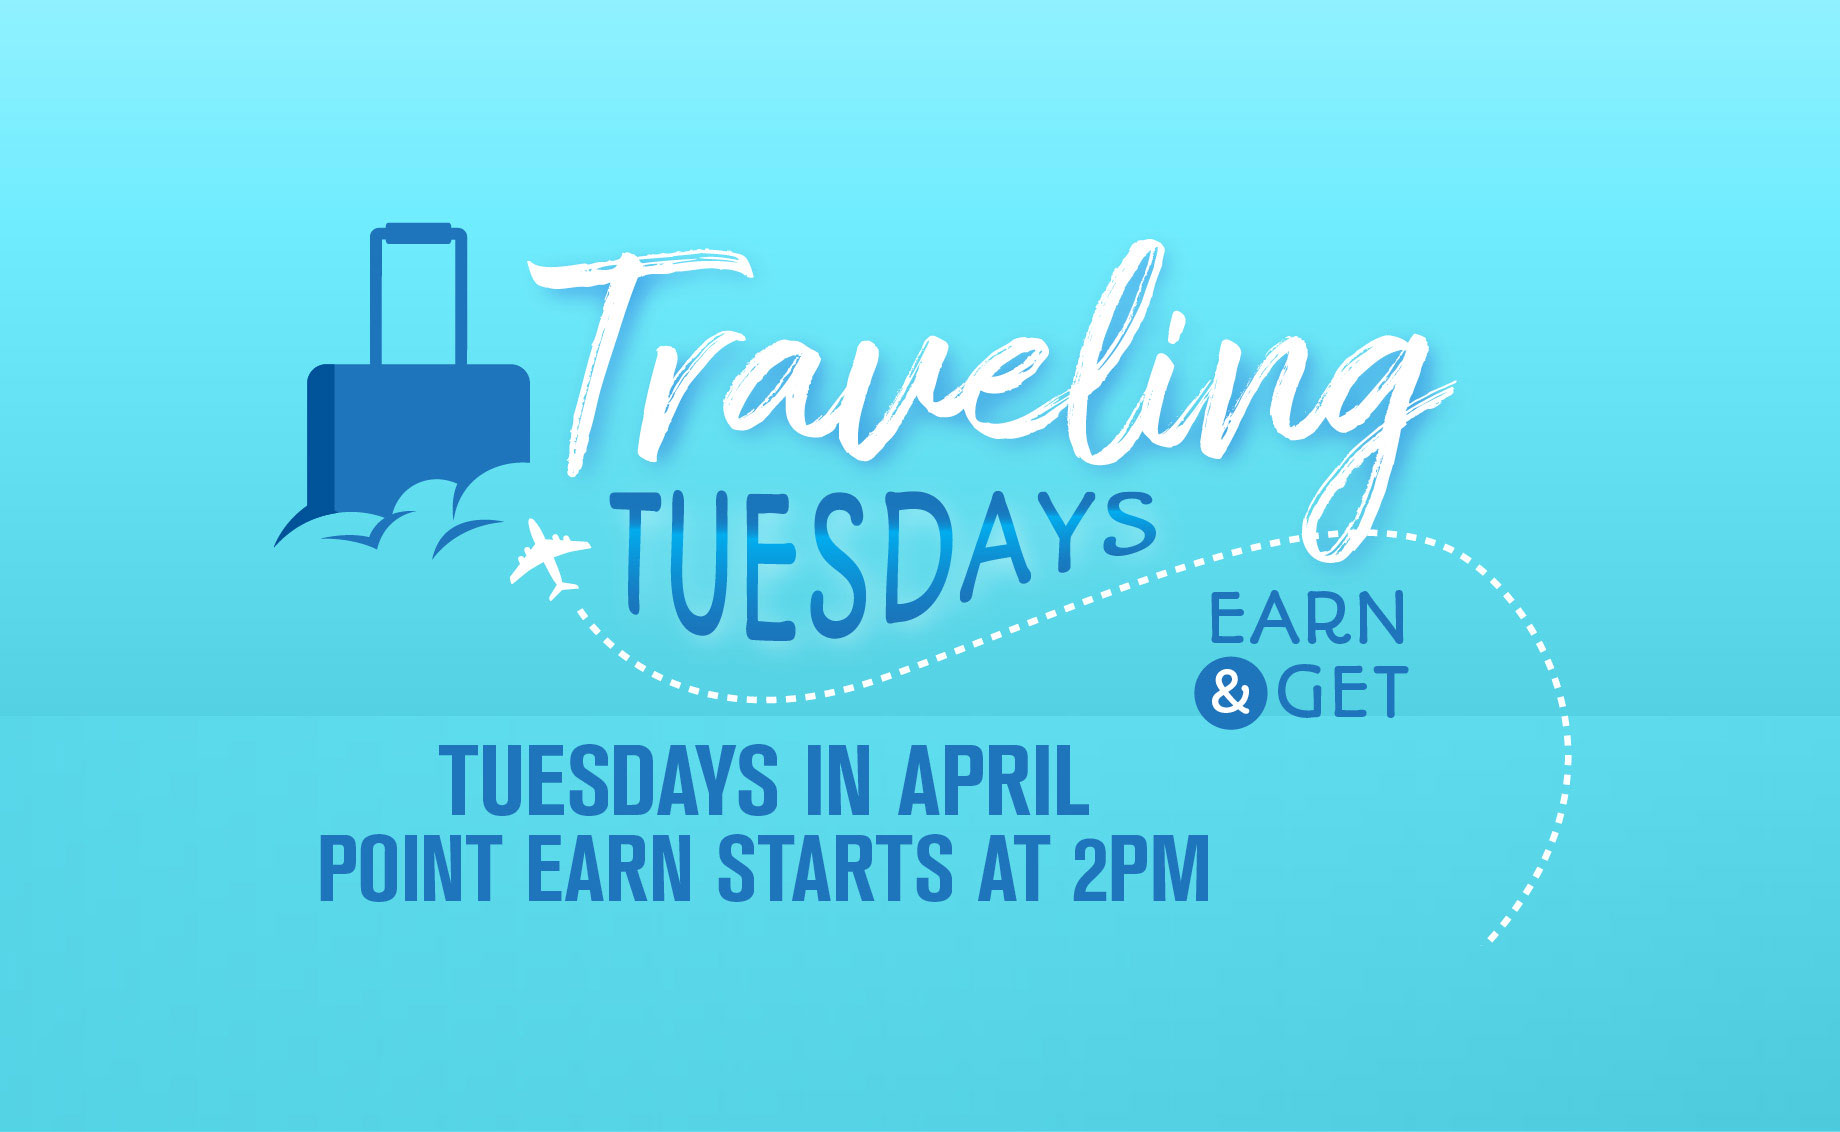 Traveling Tuesdays